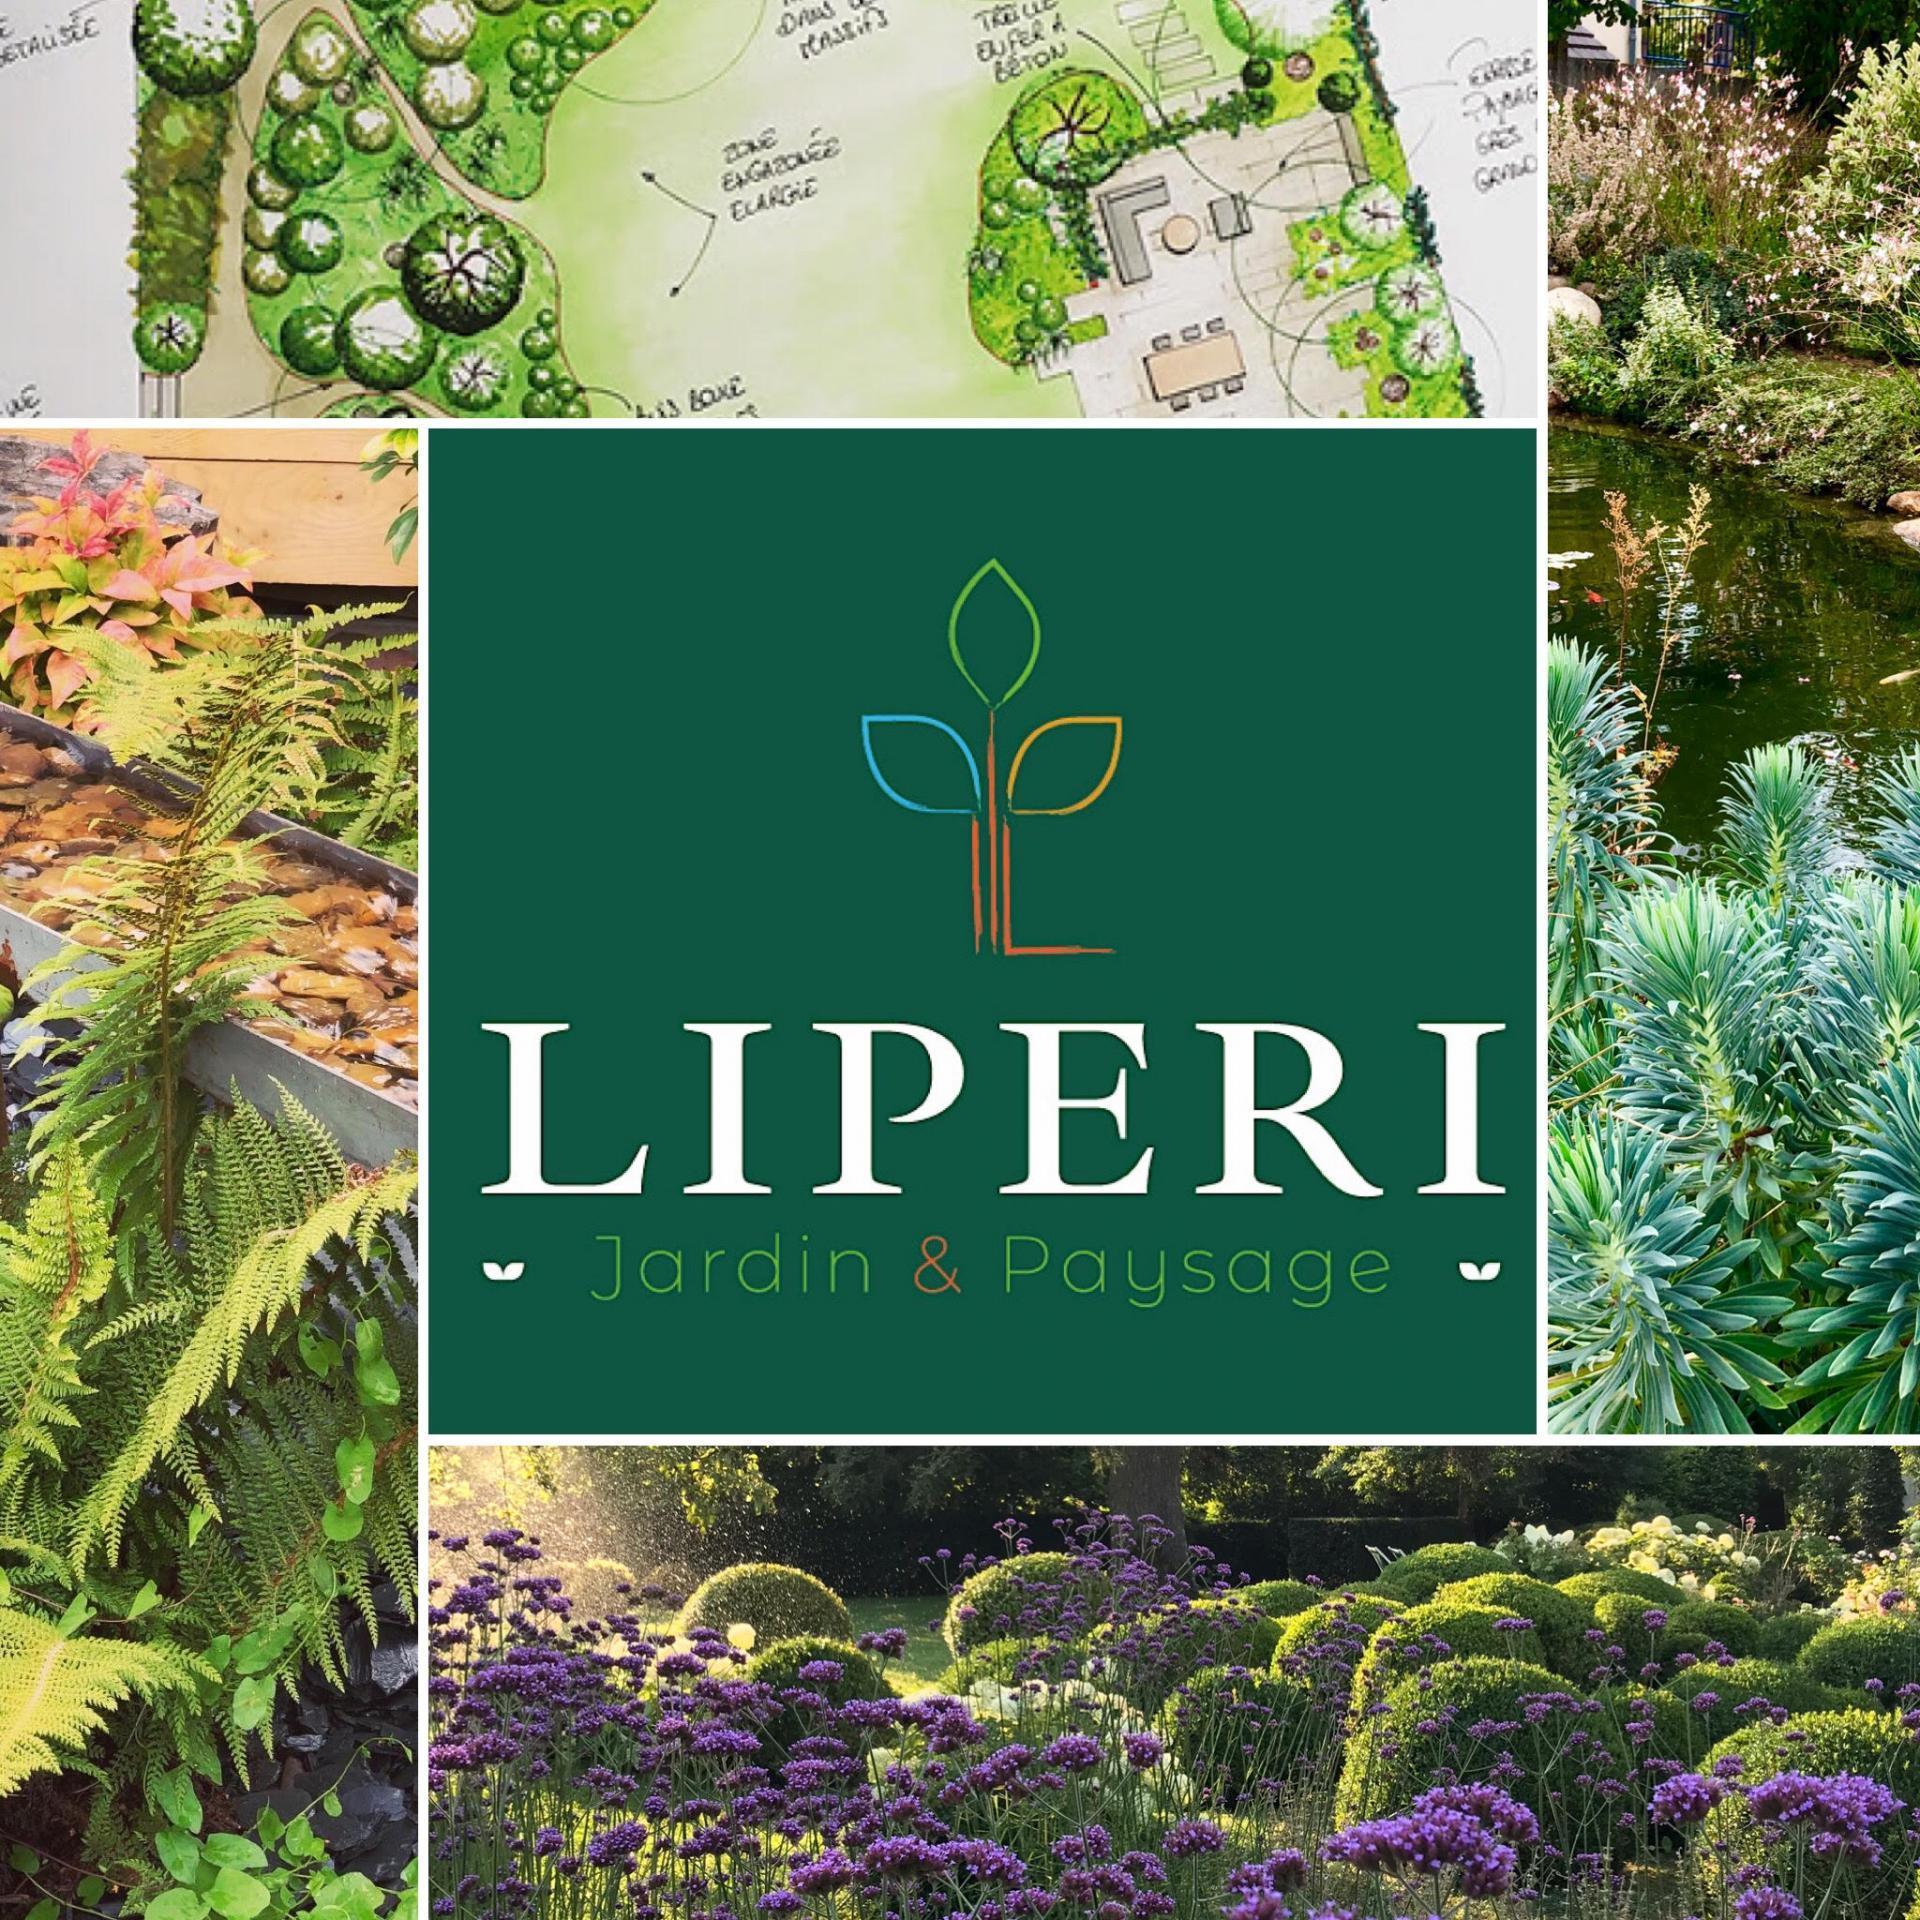 Philippe Liperi Paysagiste à Auxerre, Jardins Terrasses  & Bassins